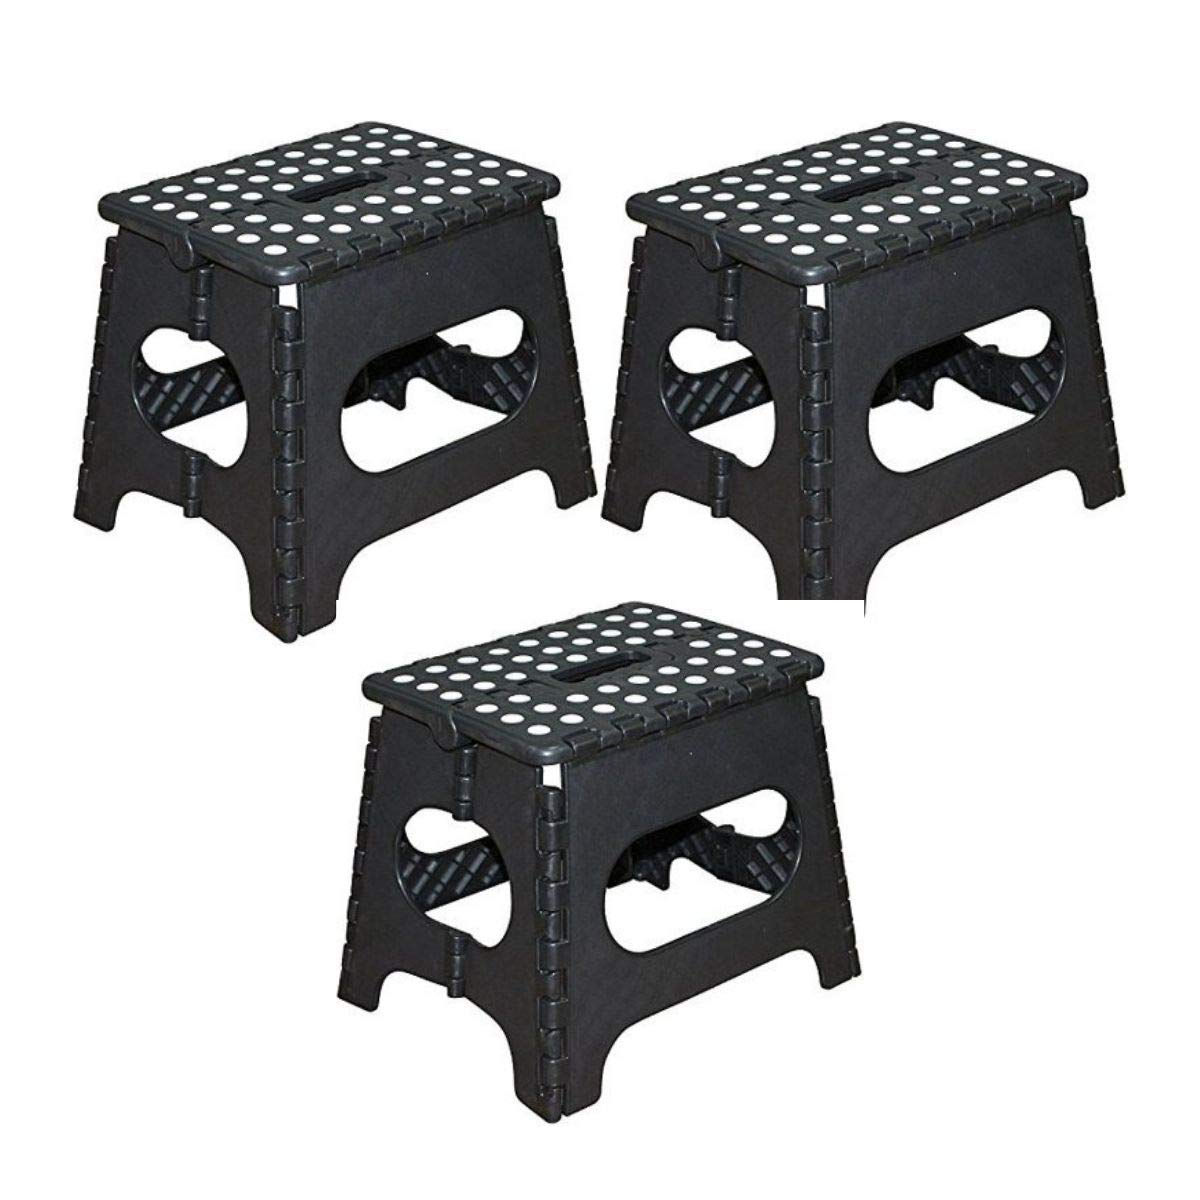 Black Jeronic 11-Inch Plastic Folding Step Stool